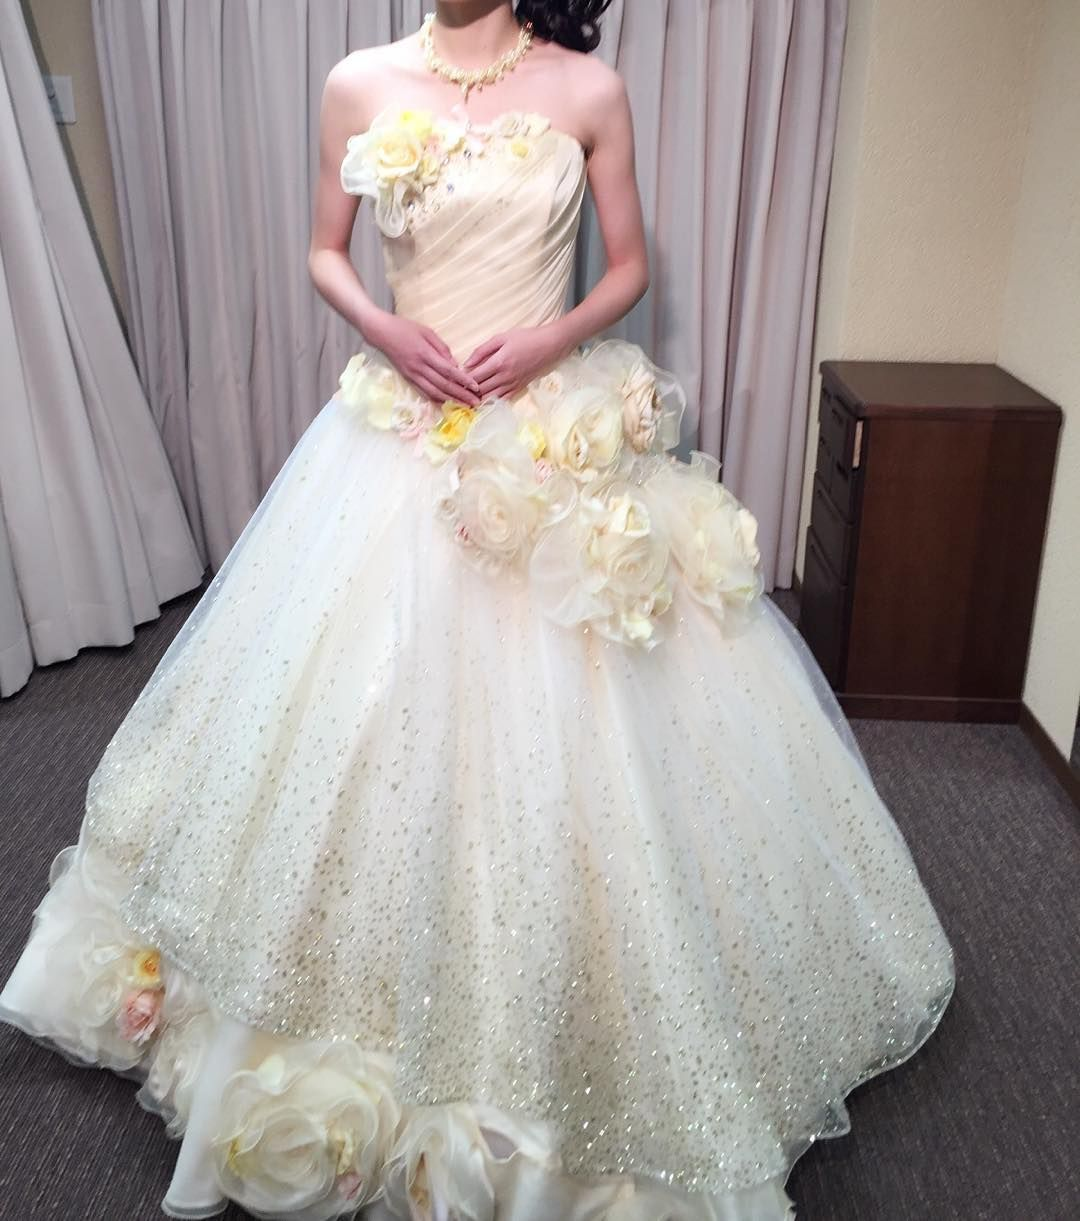 6864003477bf1 ColorDress試着 黄色で大きくて可愛いお花が付いてるドレス 落ち着いた色 ...